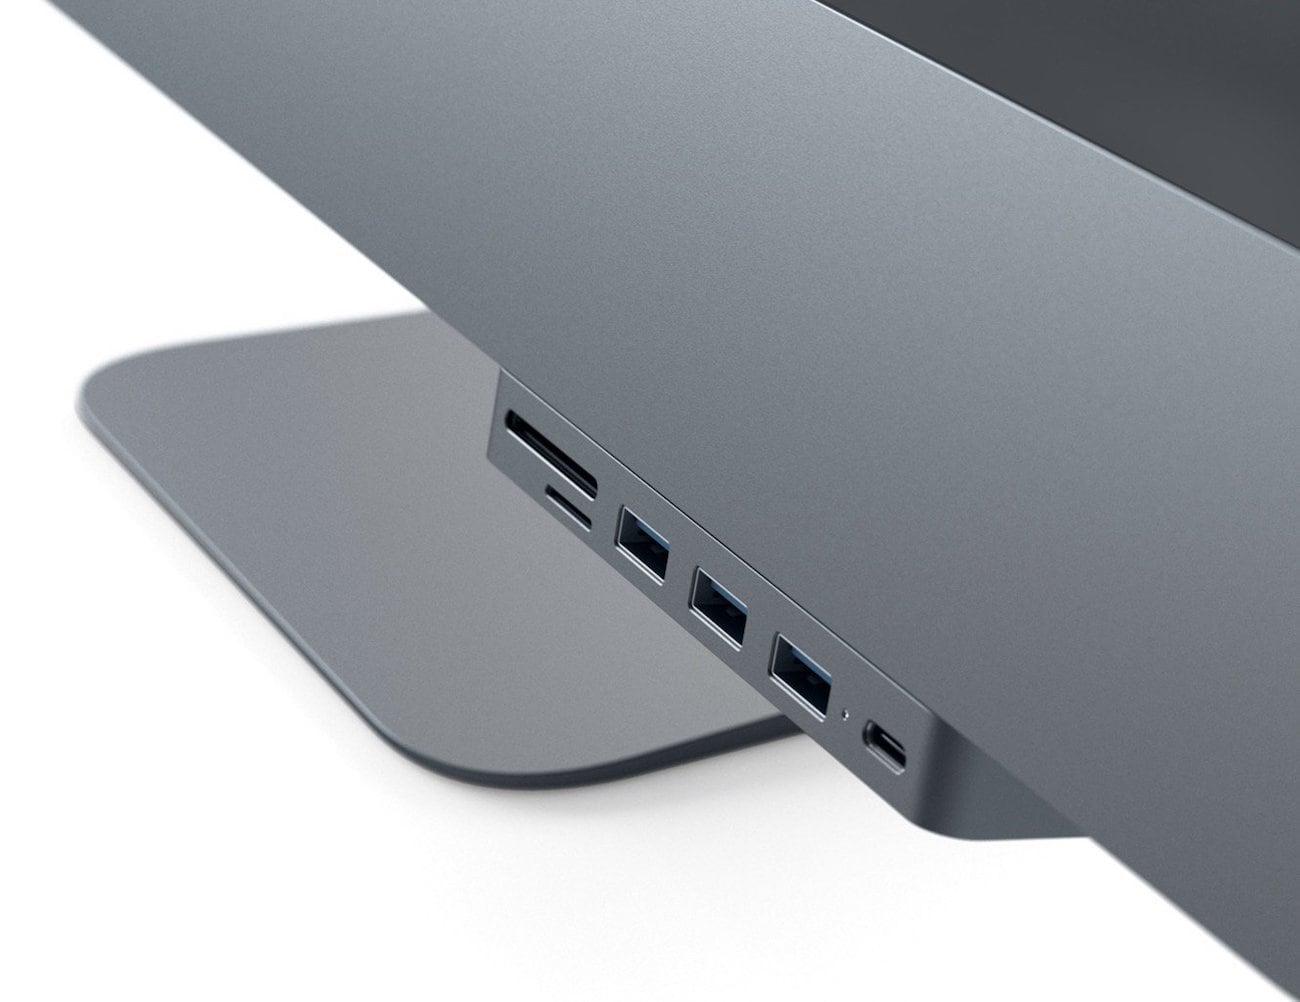 Satechi Type-C iMac Clamp Hub Pro